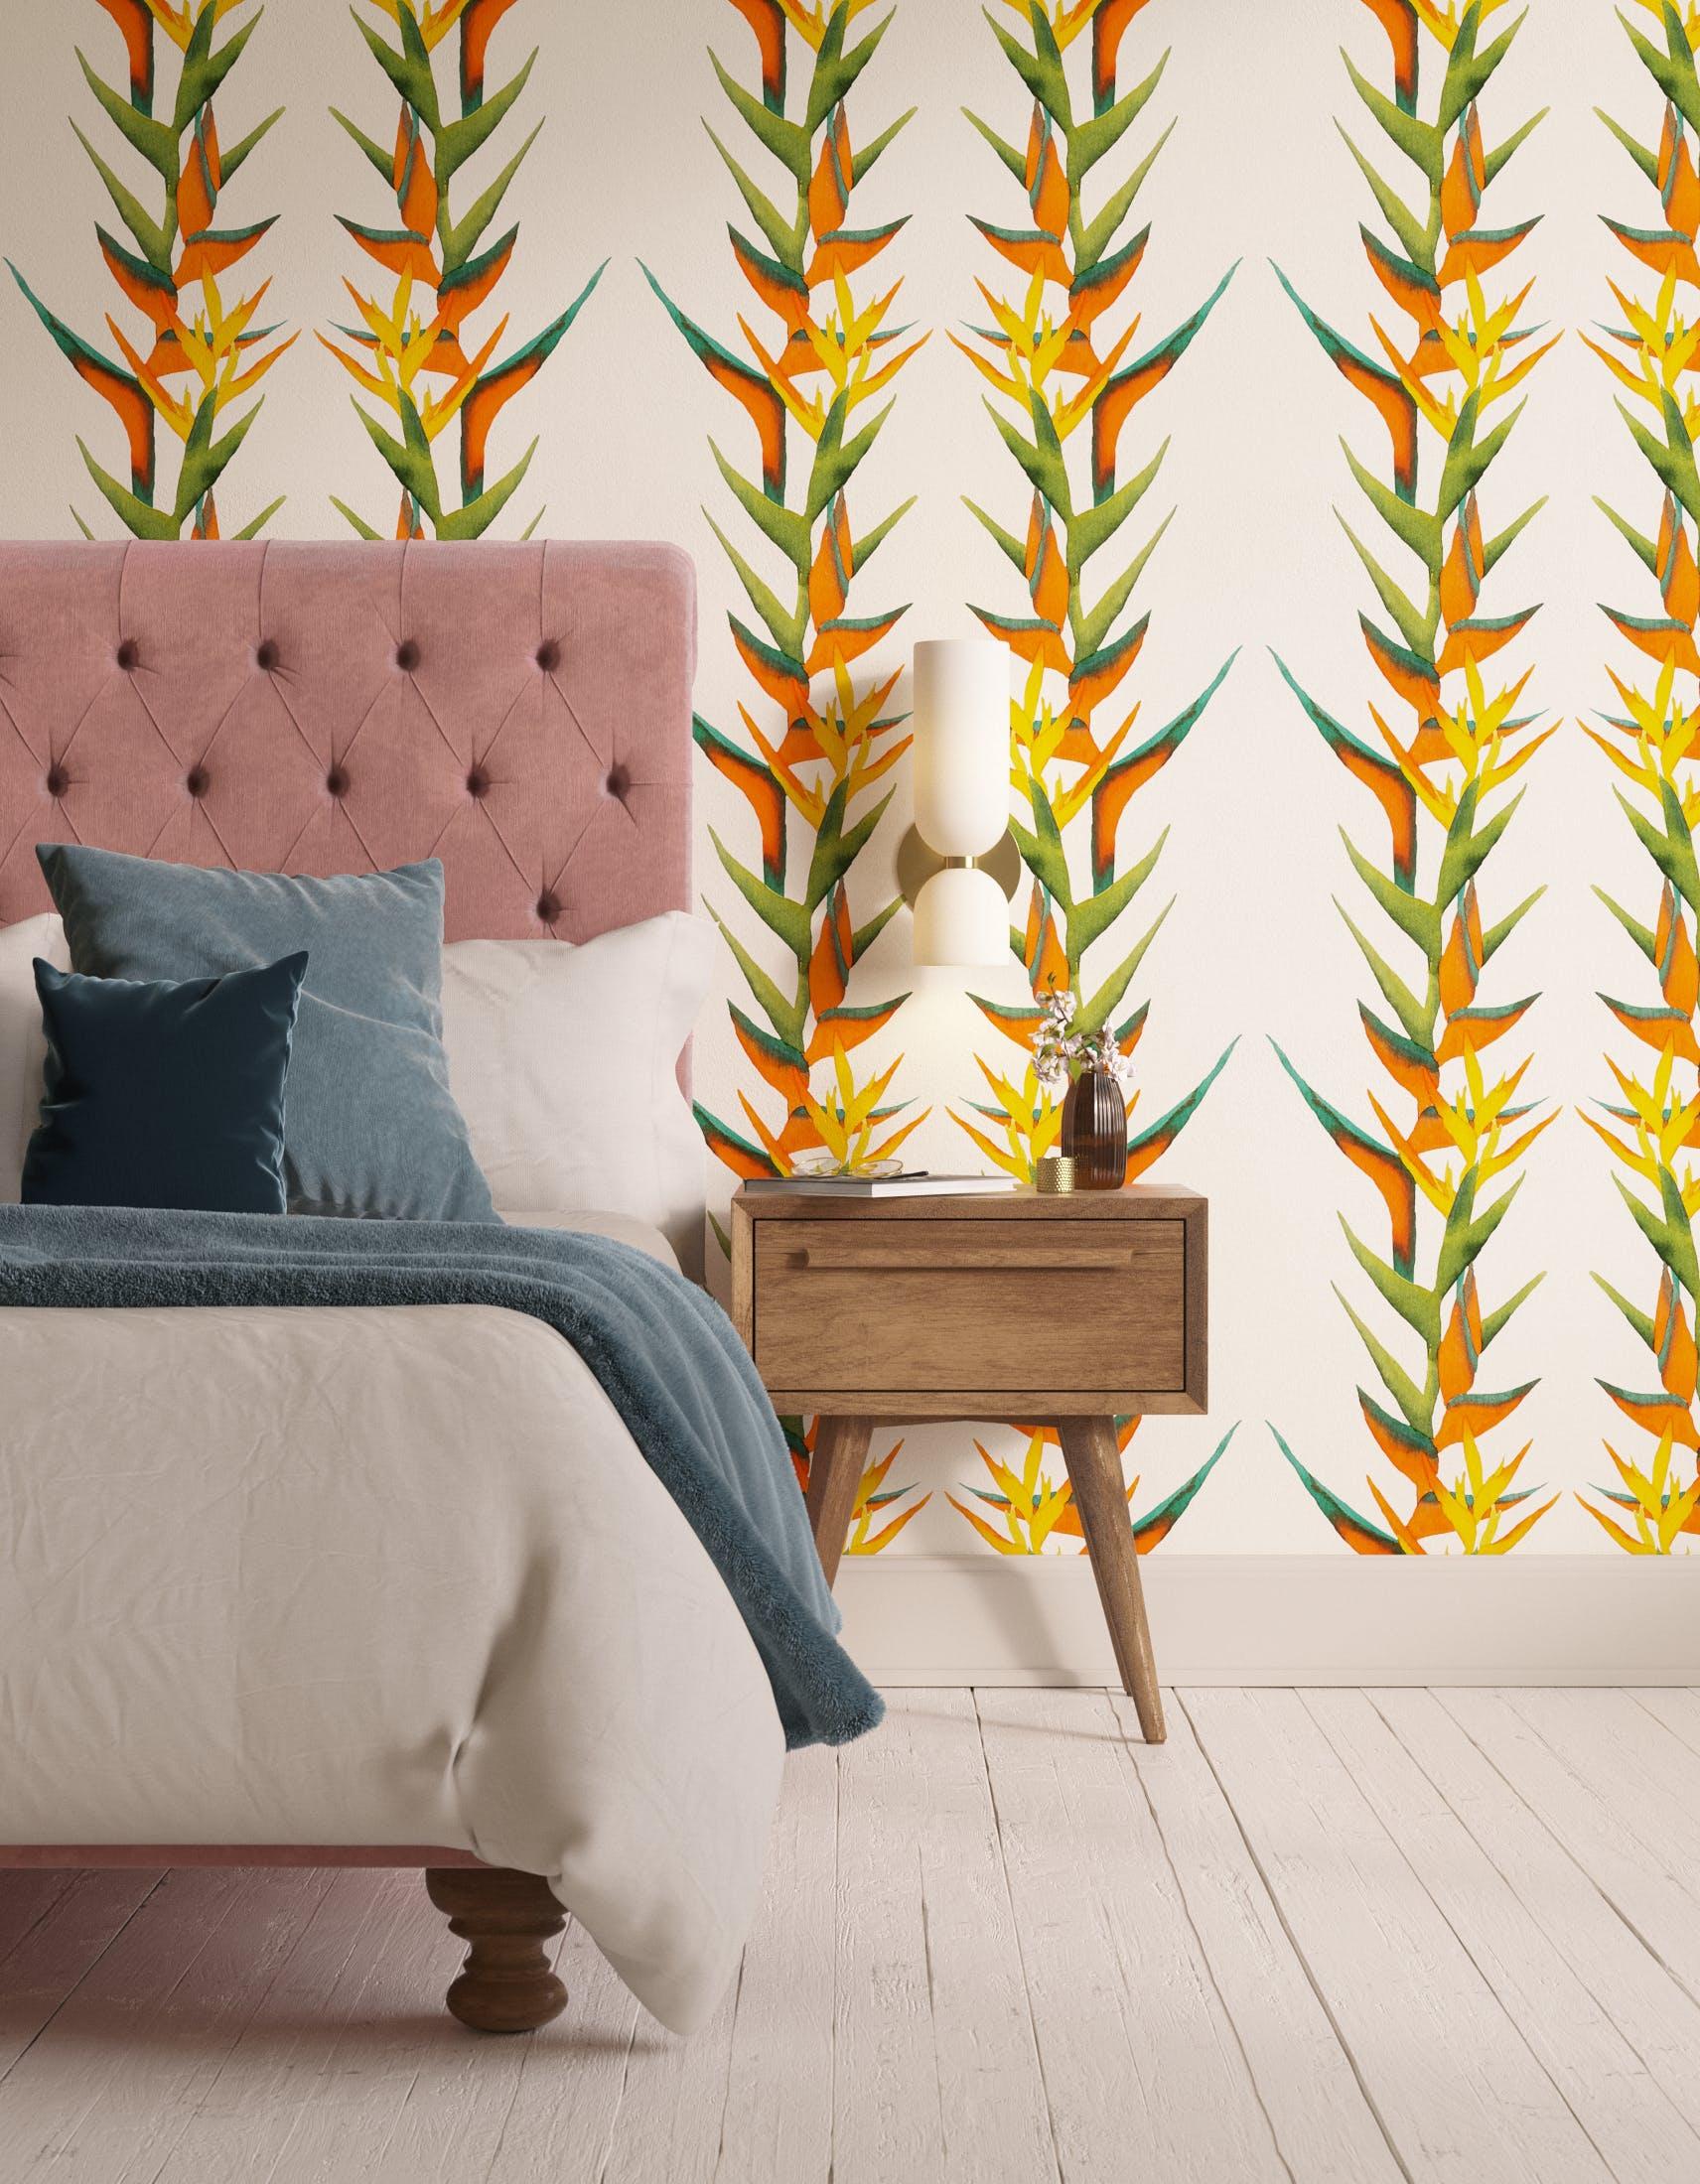 Bedroom decorated with Lick x Belinda Bayley Paradise Vine 01 orange exotic botanical wallpaper